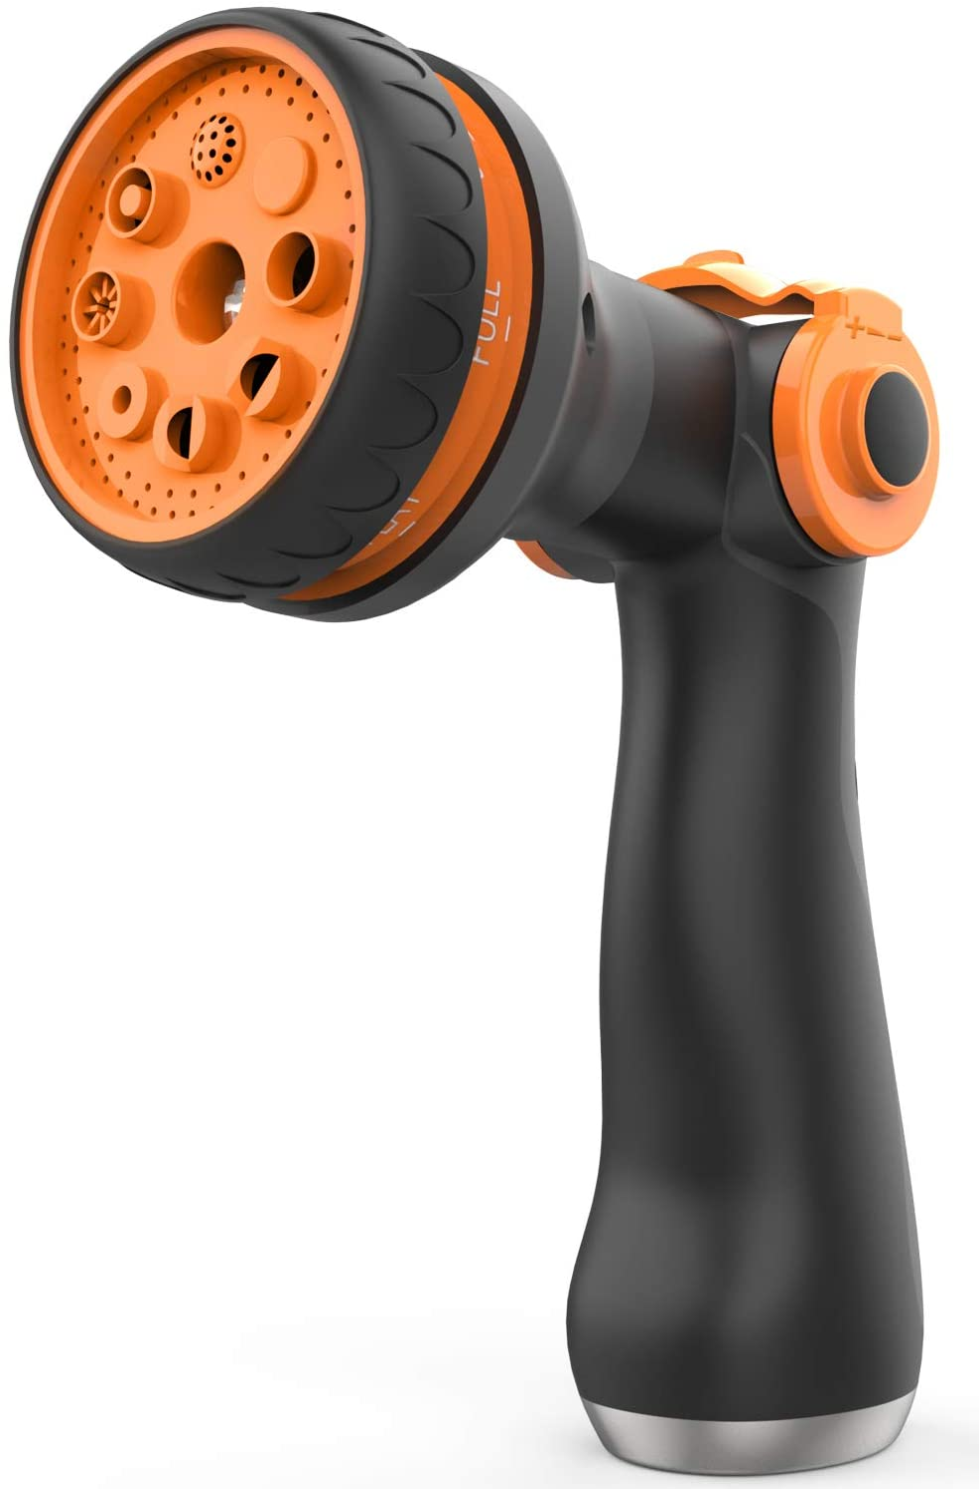 Waysonl Hose Nozzle Garden, Spray Nozzle High Pressure with 8 Adjustable Watering Patterns Thumb Control, Slip Resistant Heavy Duty Water Hose Nozzle for Garden Hose, Watering, Washing, Cleaning : Garden & Outdoor